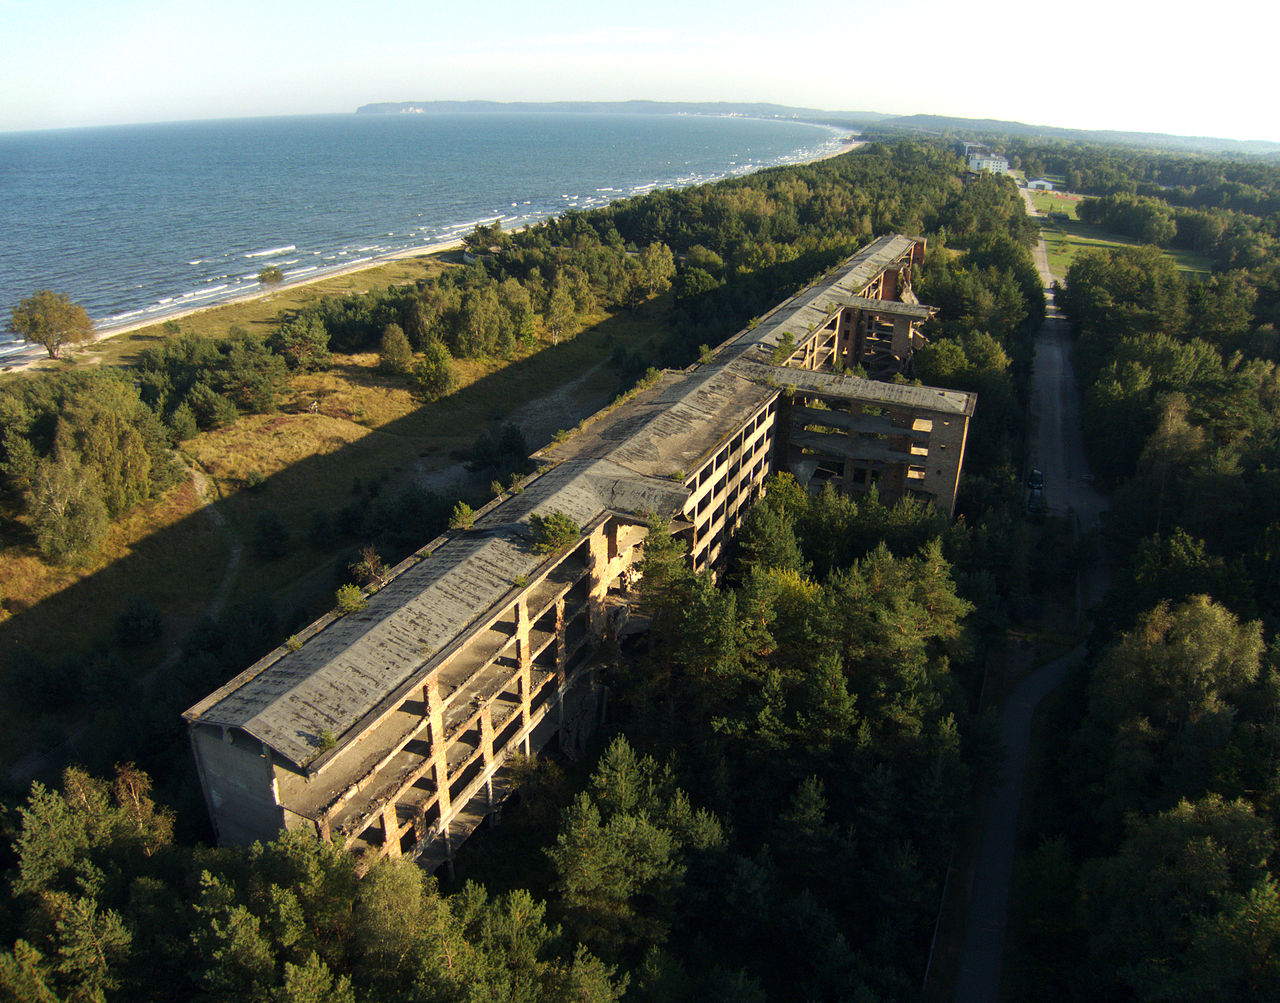 Prora a former nazi holiday resort transformed into a for Nazi holiday resort